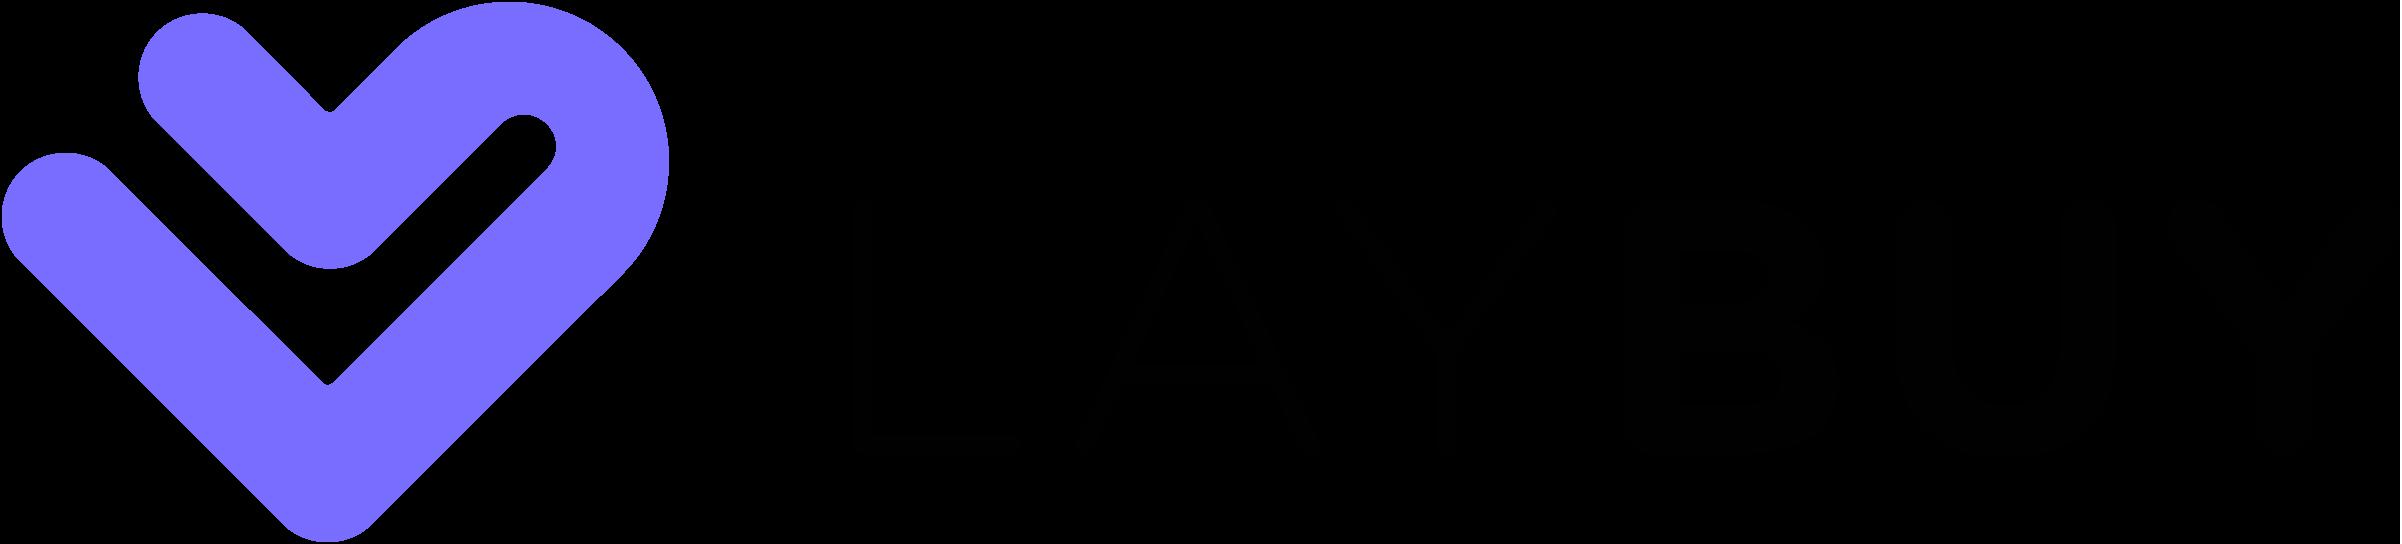 :aybuy payment option logo